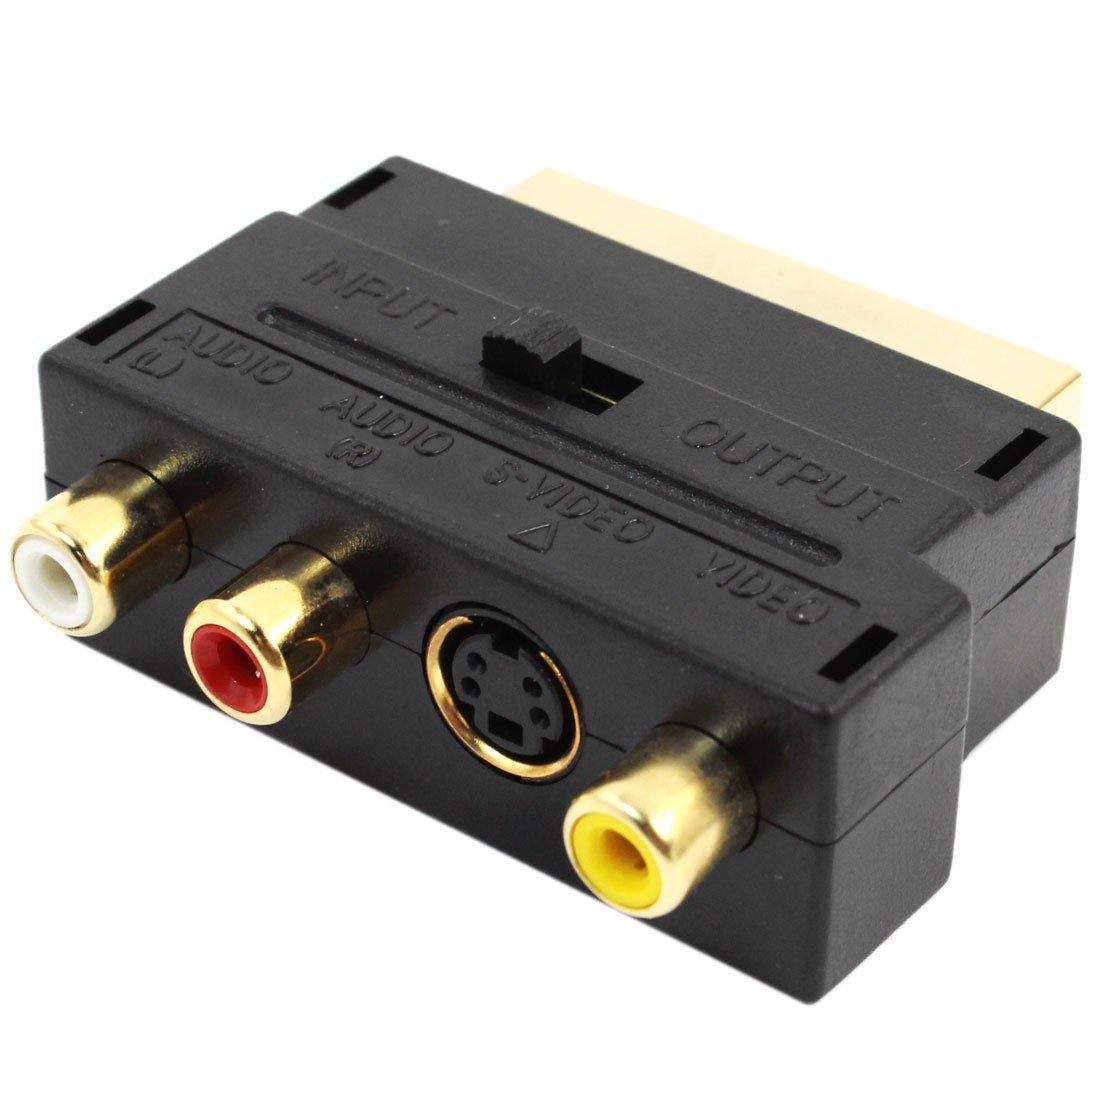 20 Pin Male To Female Pin 3 RCA AV + S-Video Adapter - Black